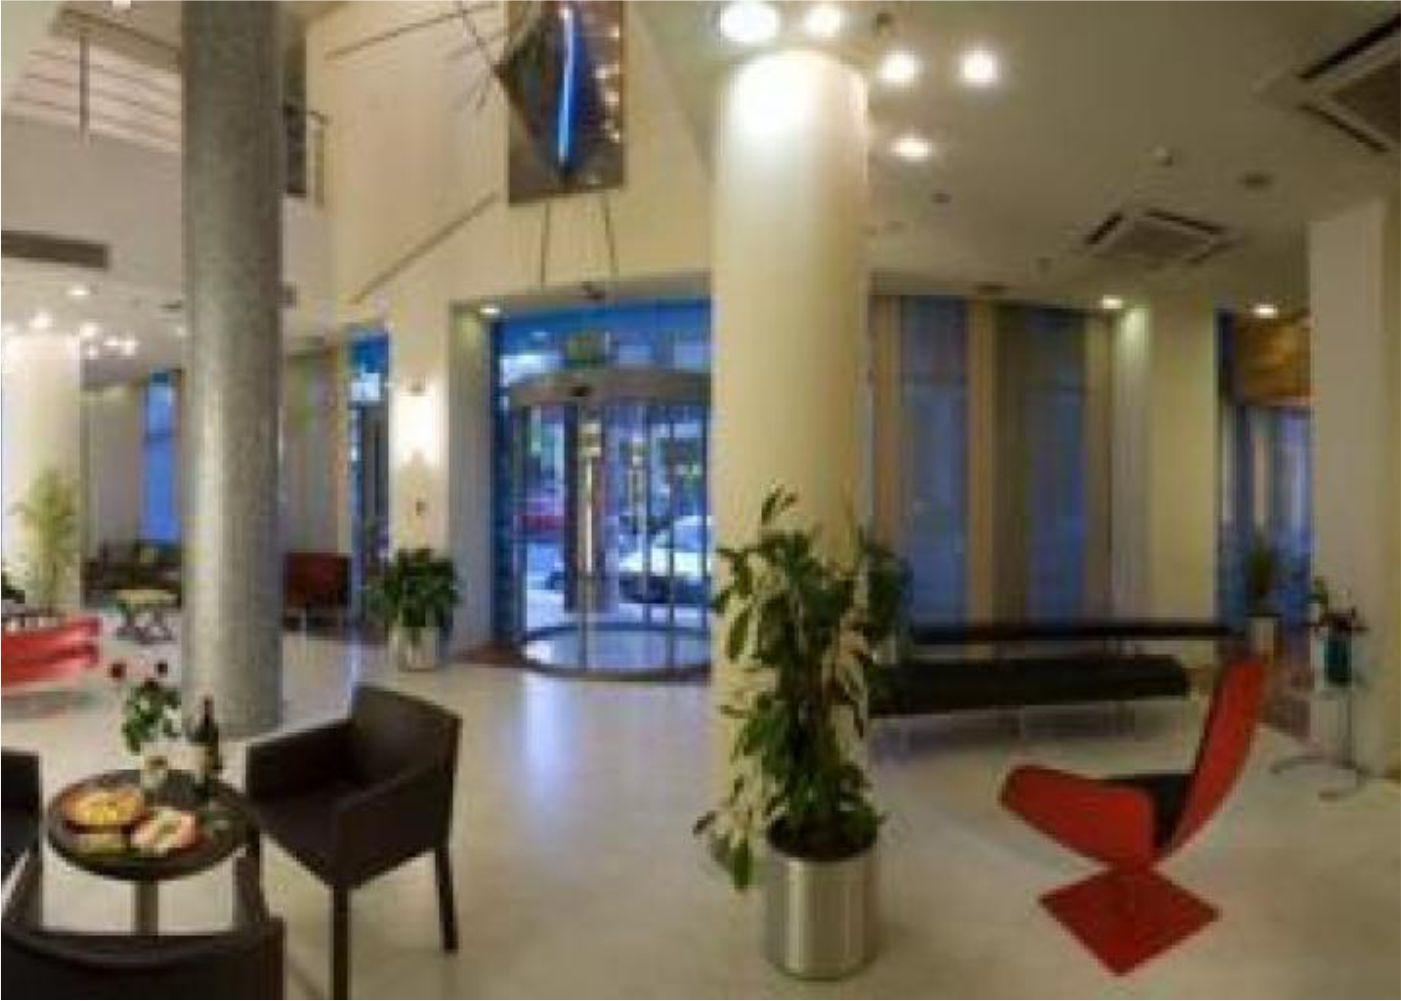 paraskevi-interior-kaningos-21-hotel-5